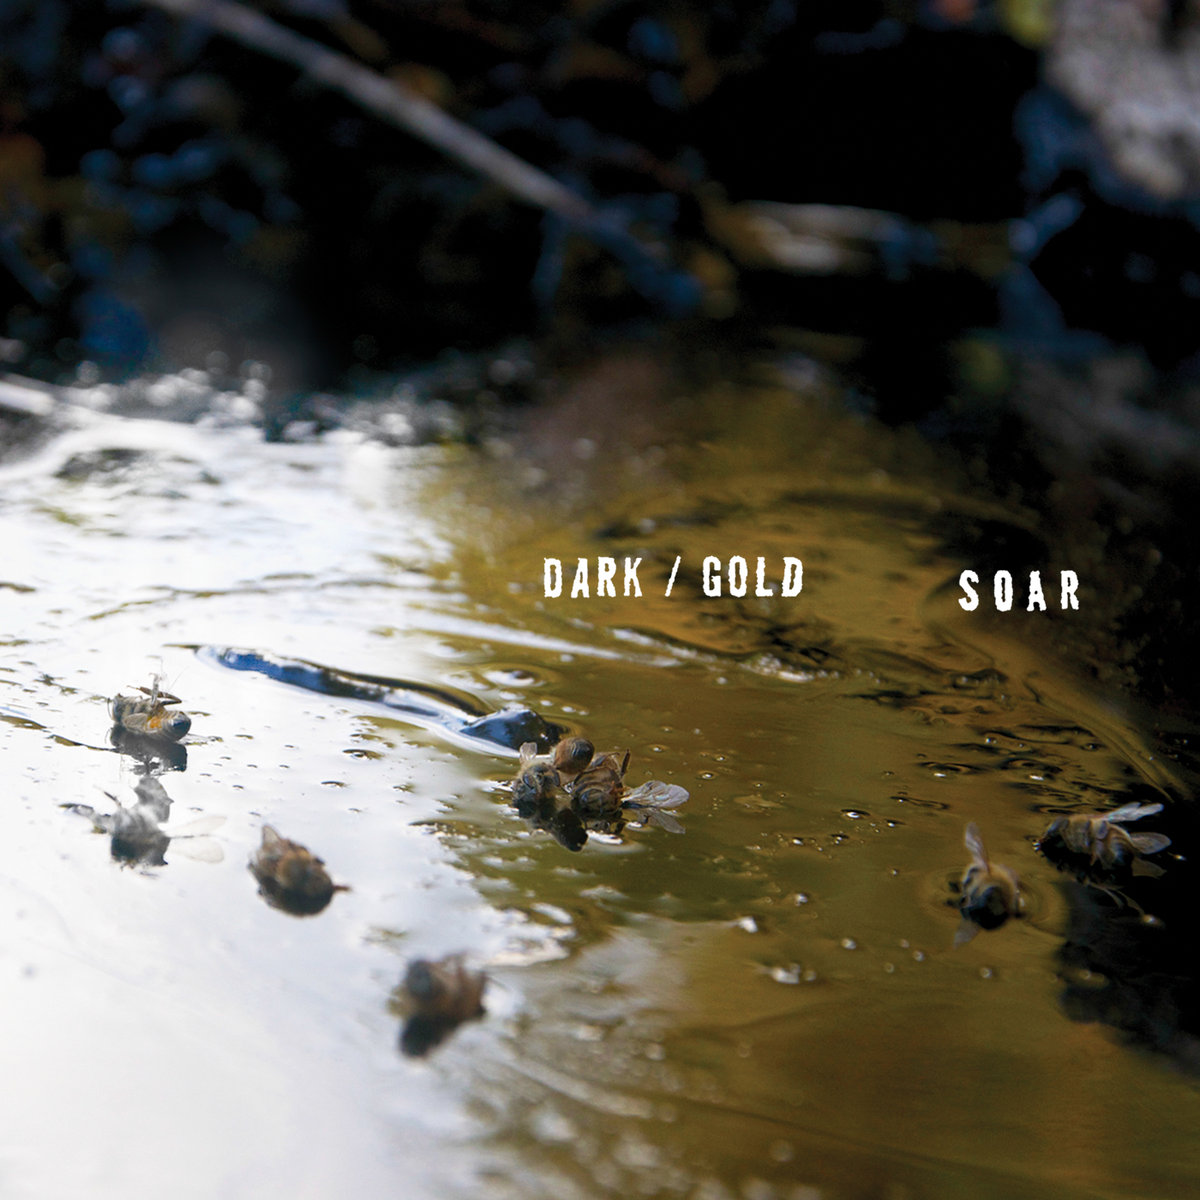 SOAR dark gold album cover